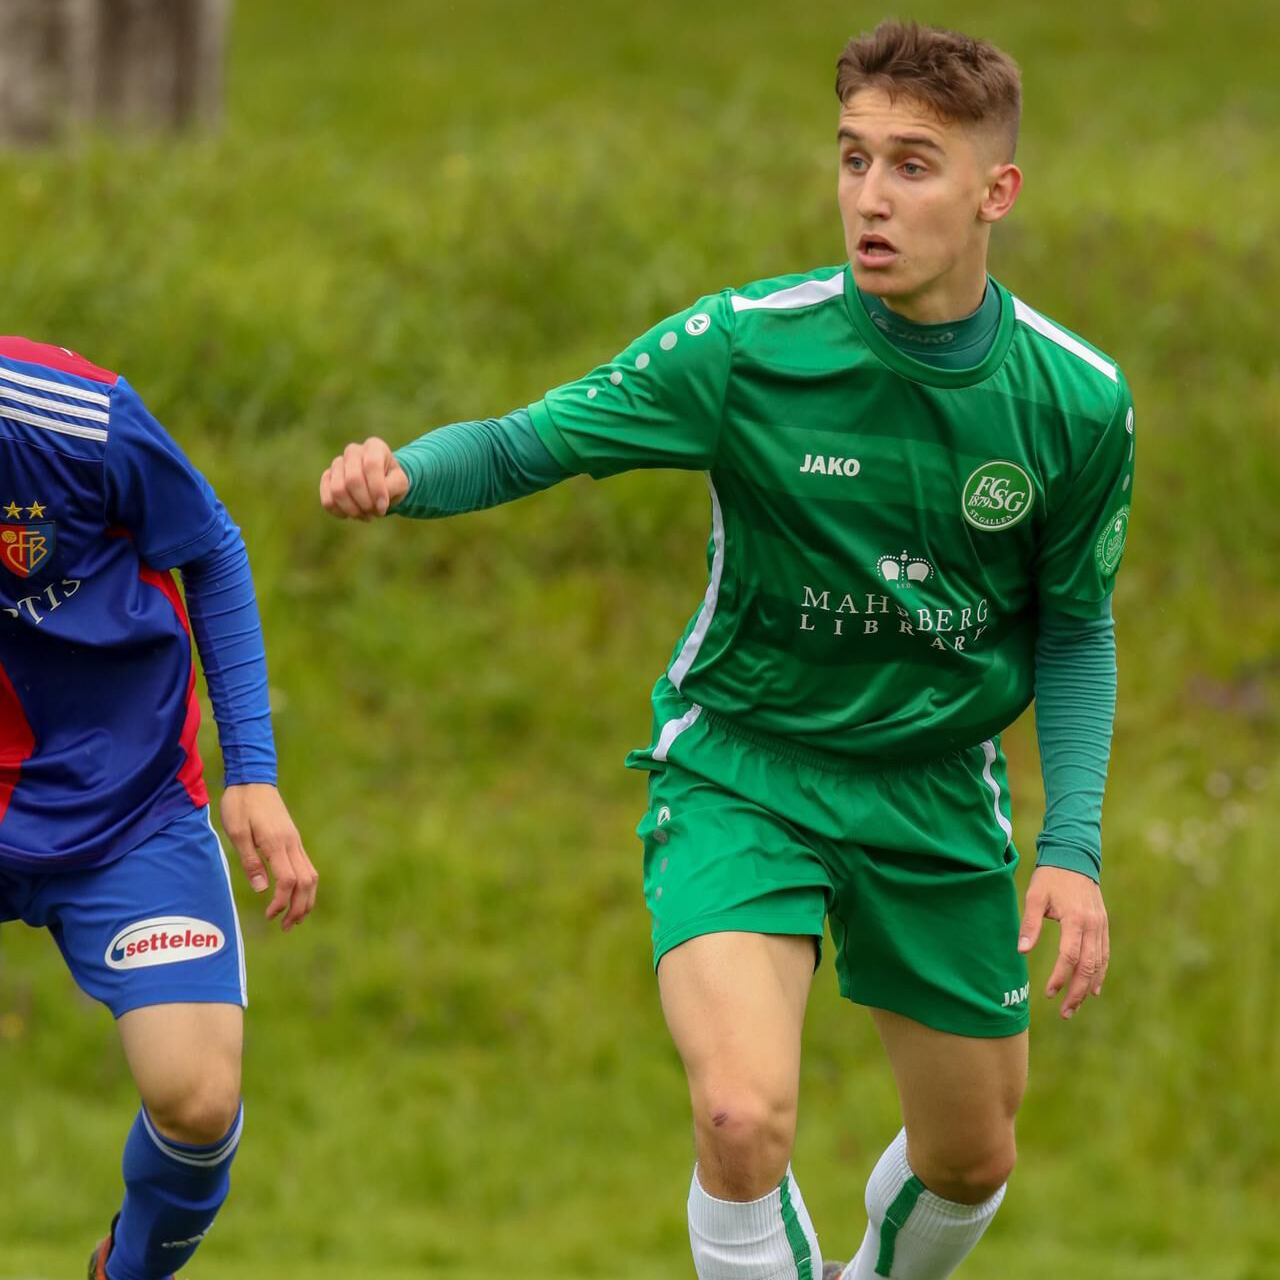 Alessandro Mogus Angriff 09.04.2003 FC St. Gallen U18